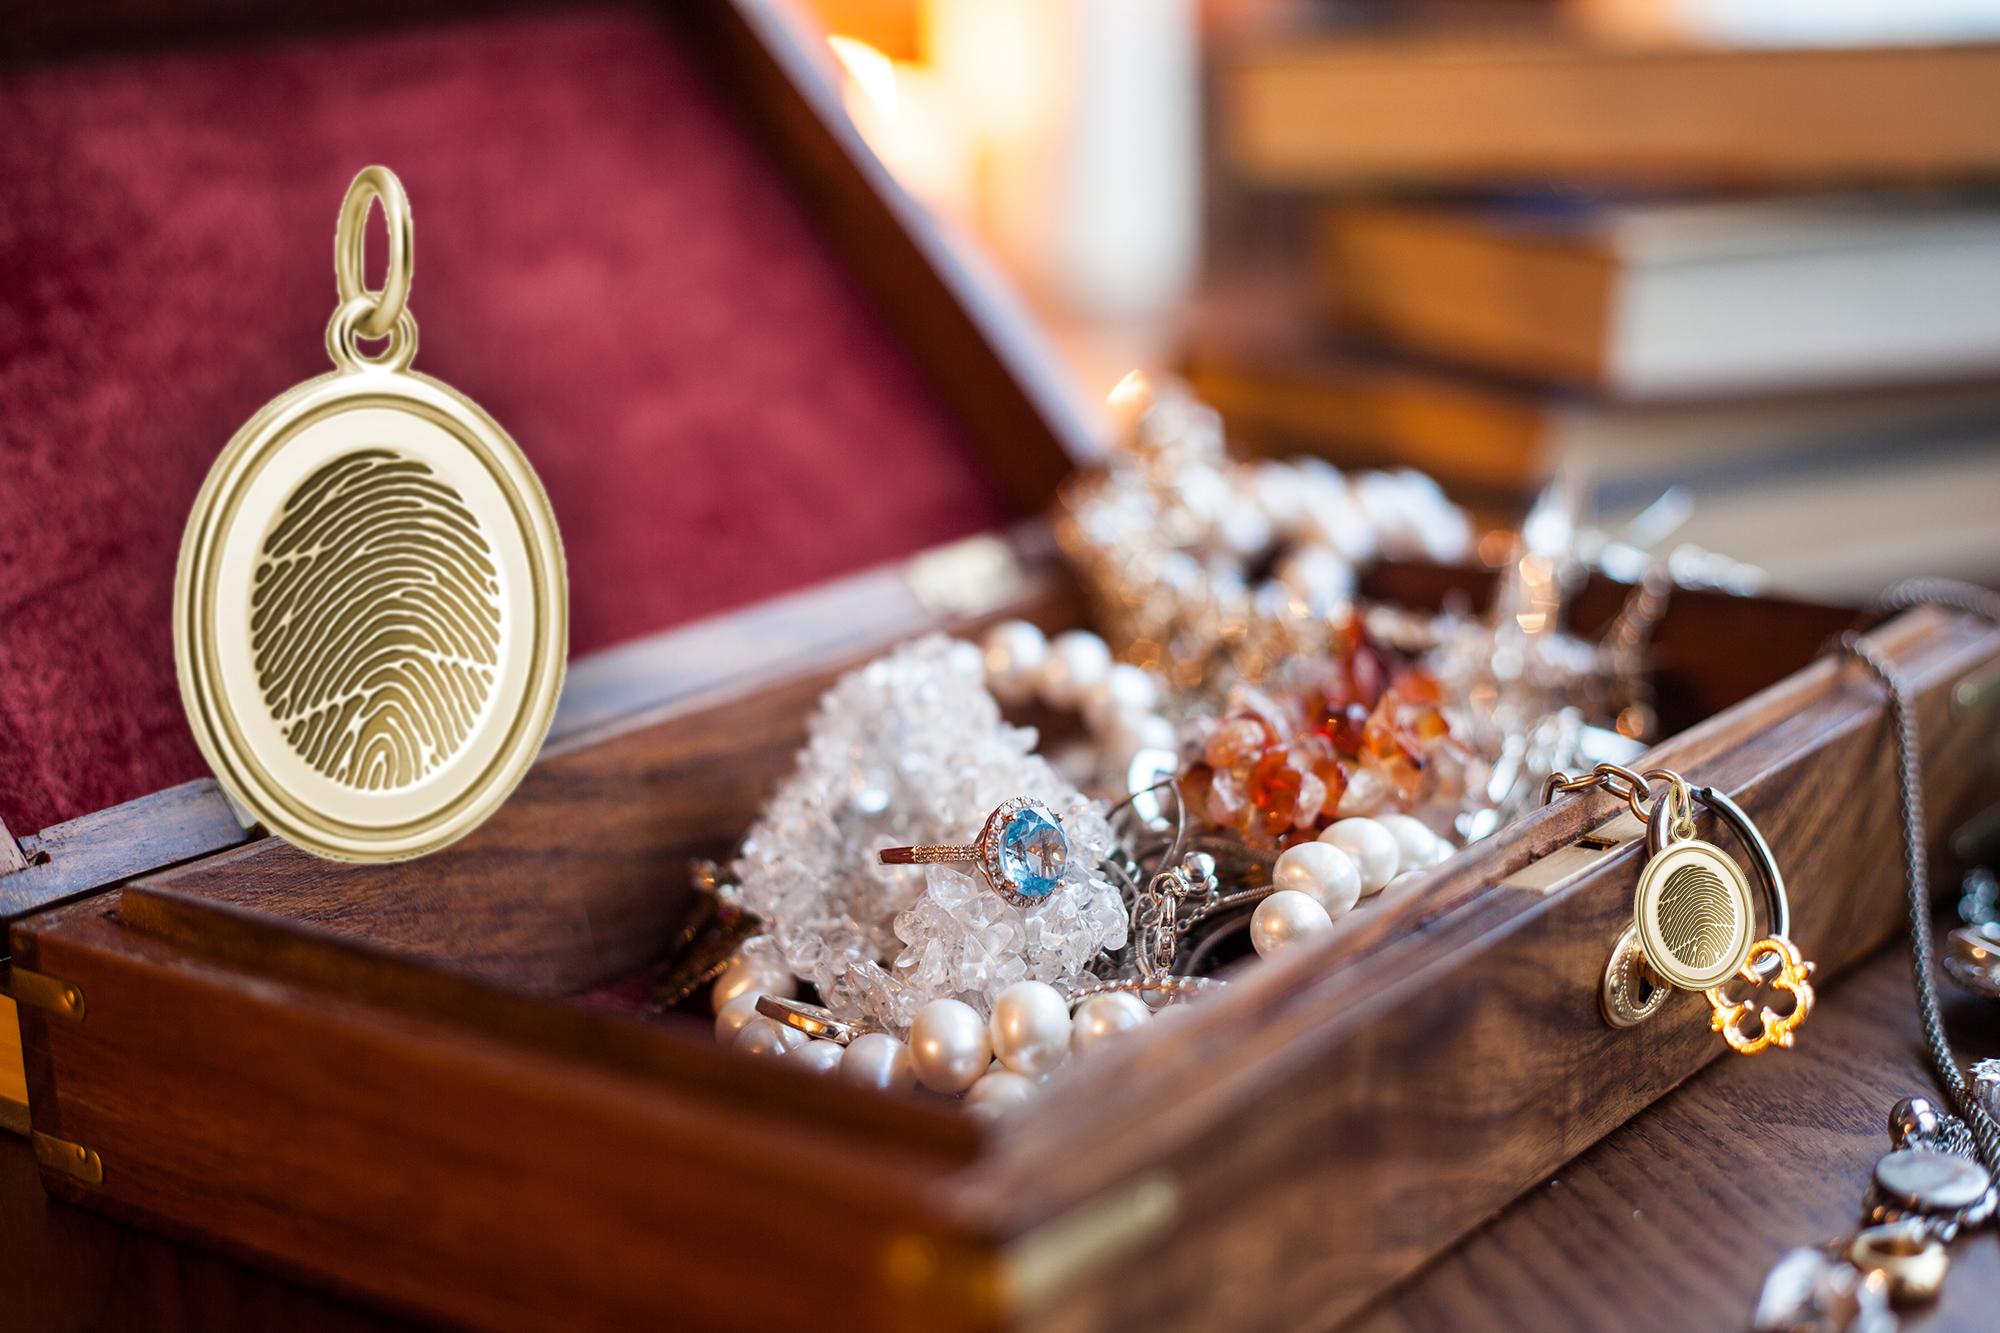 pendant-with-fingerprint-in-jewelry-box